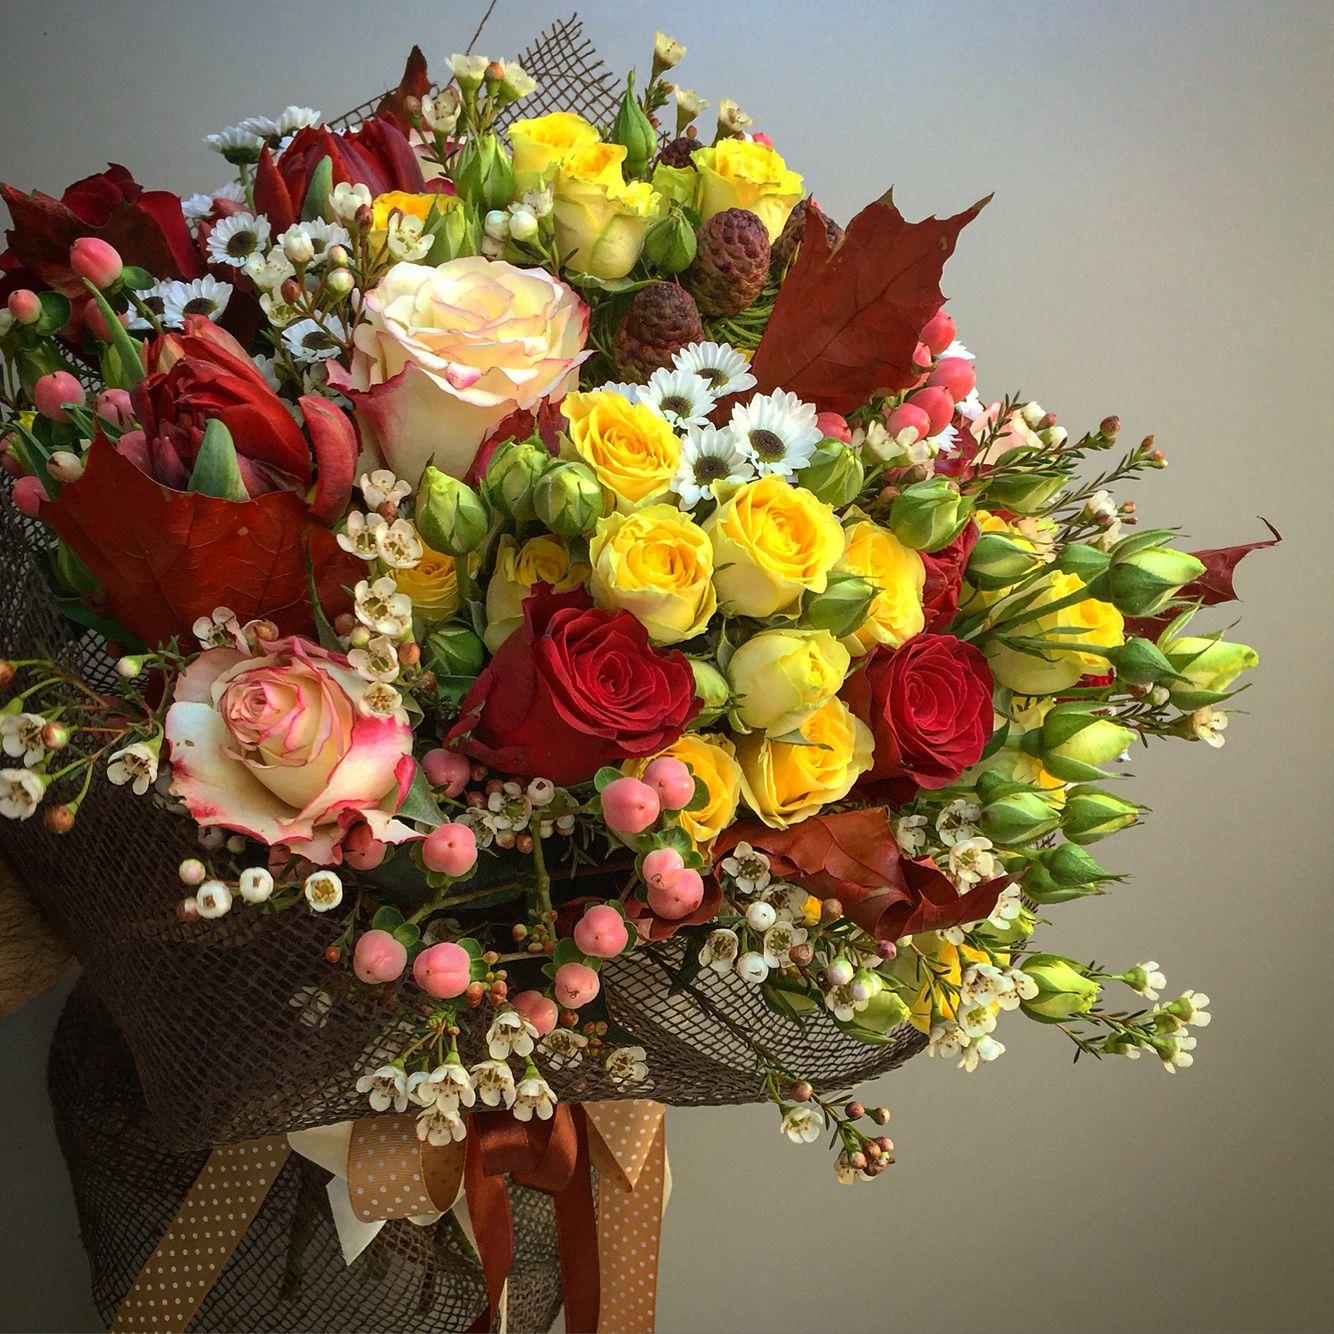 Autumn Flower Bouquet Flower Arrangements Pinterest Autumn